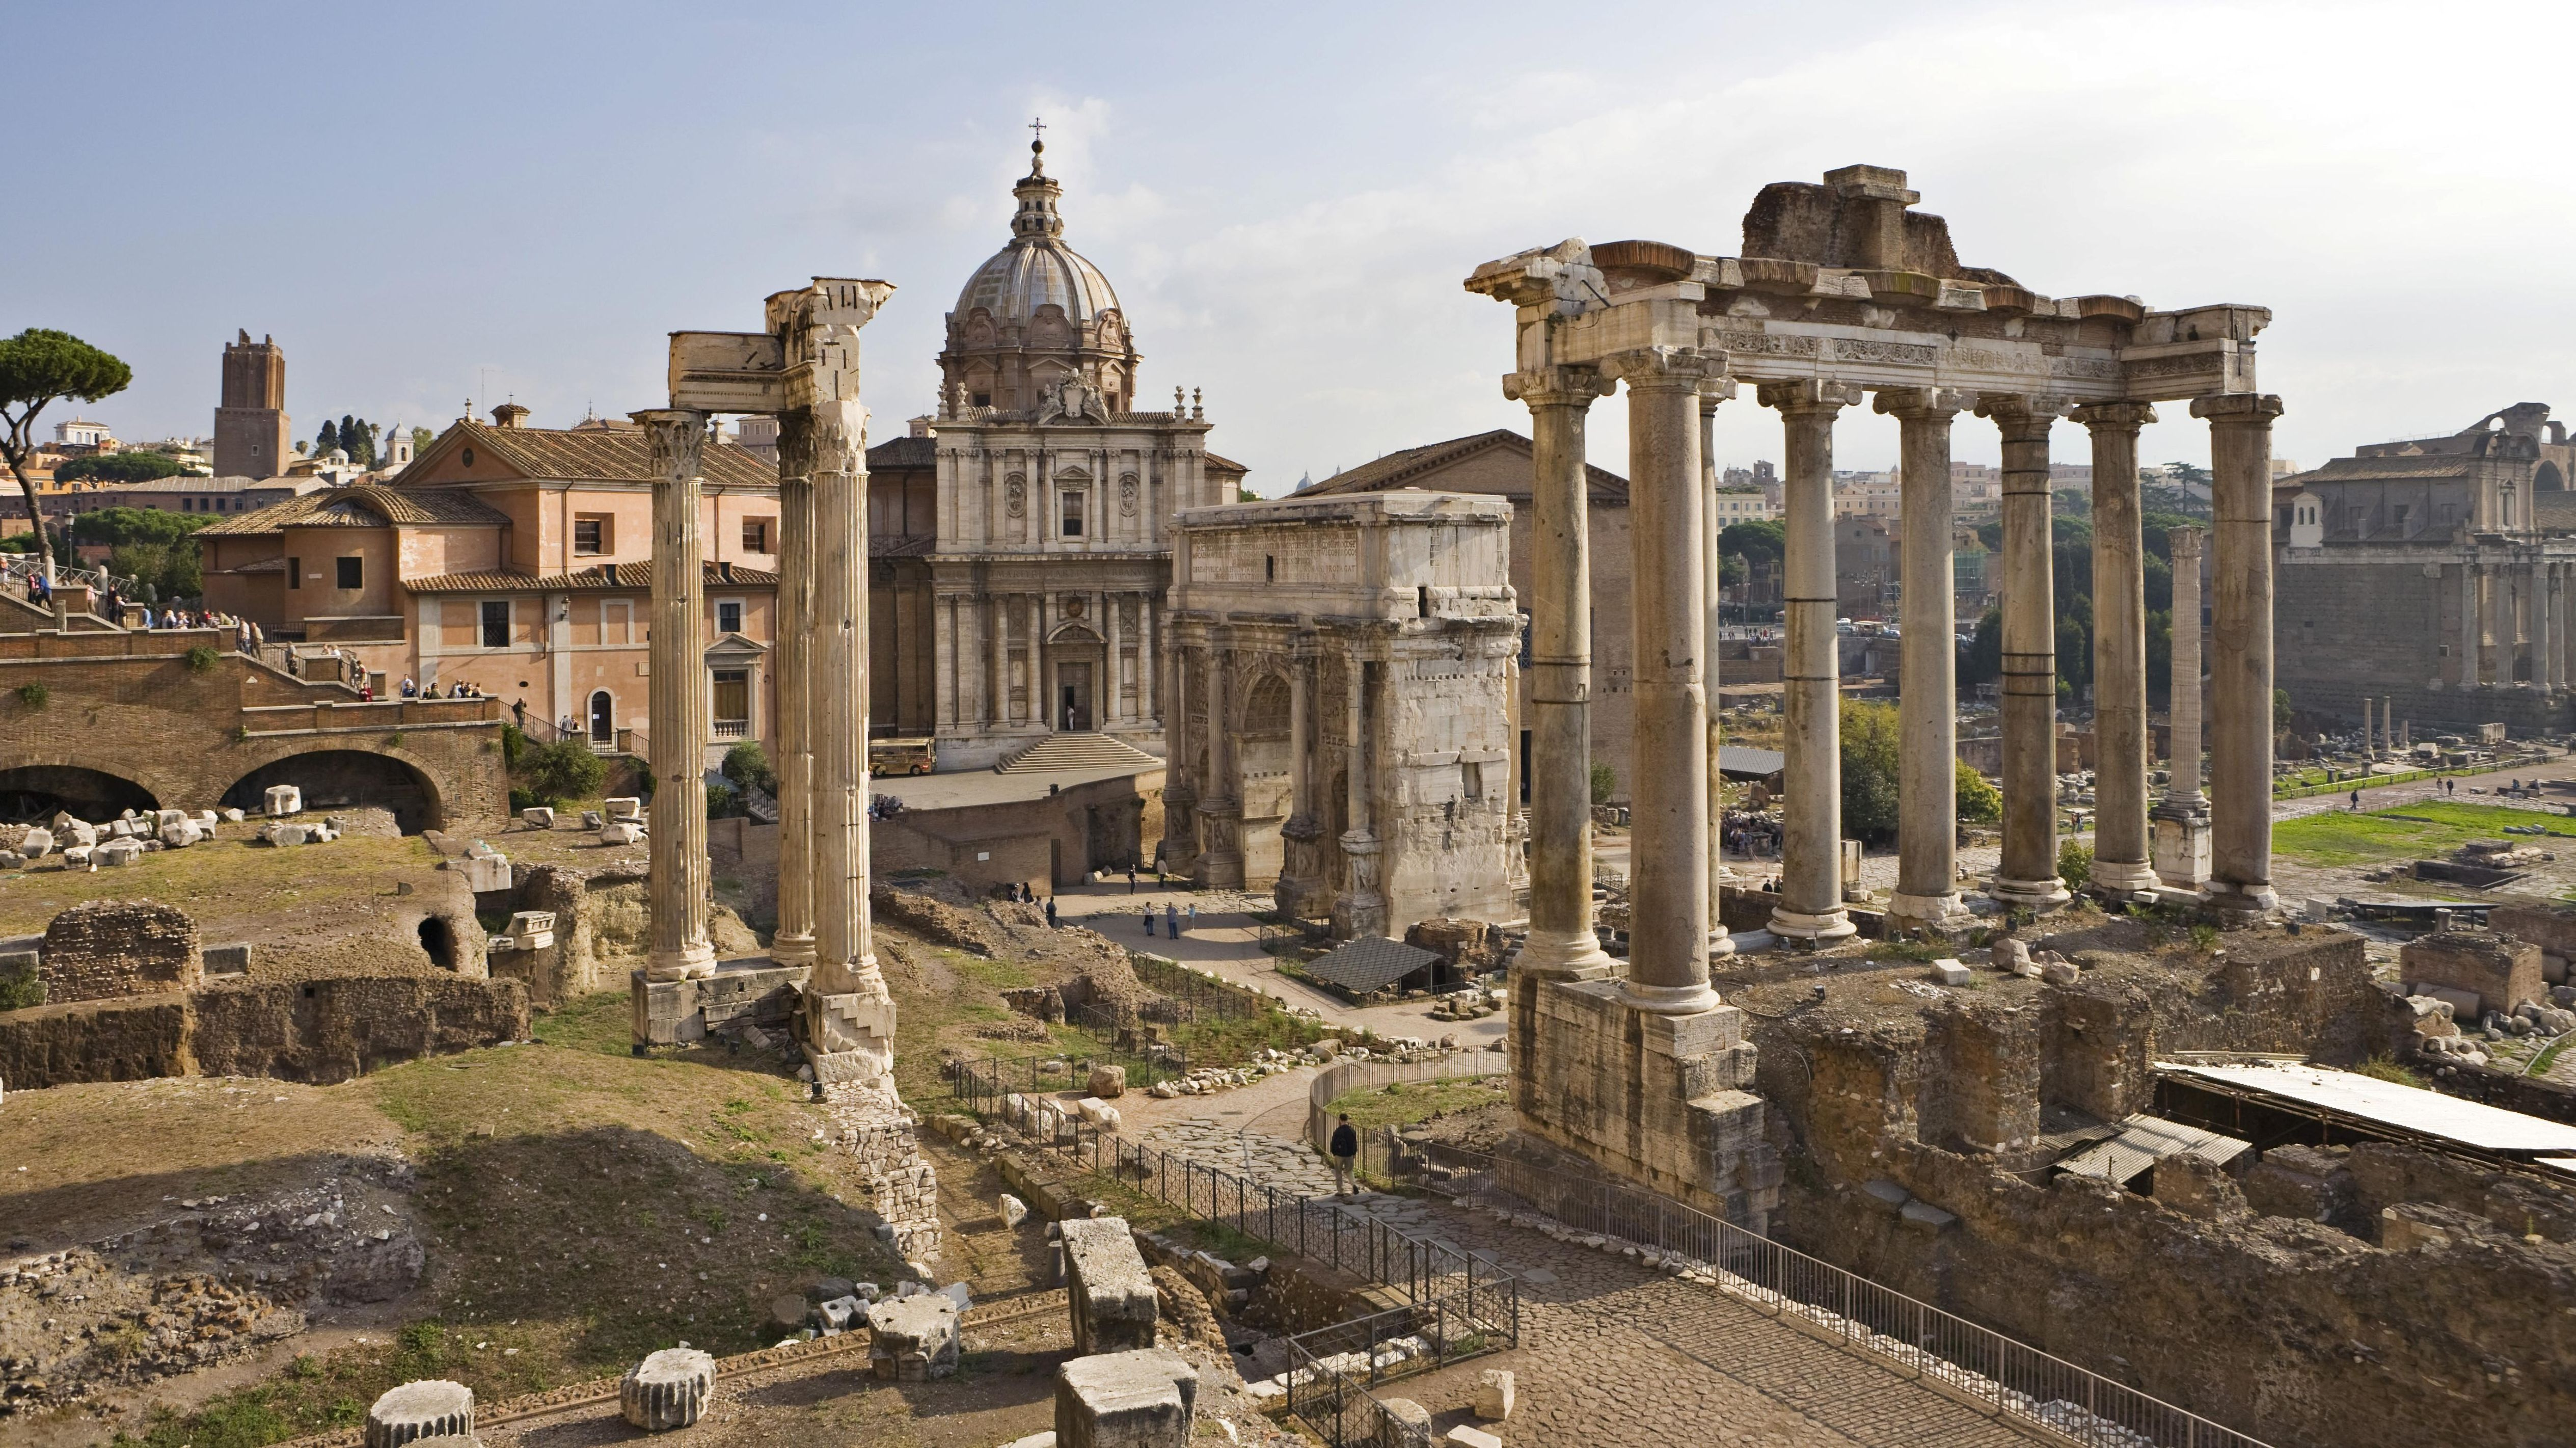 Blick die Via sacra vom Kapitol abwärts mit Vespasiantempel (links) und Saturntempel (rechts) dahinter Kirche SS Luca e Martina auf dem Forum Romanum